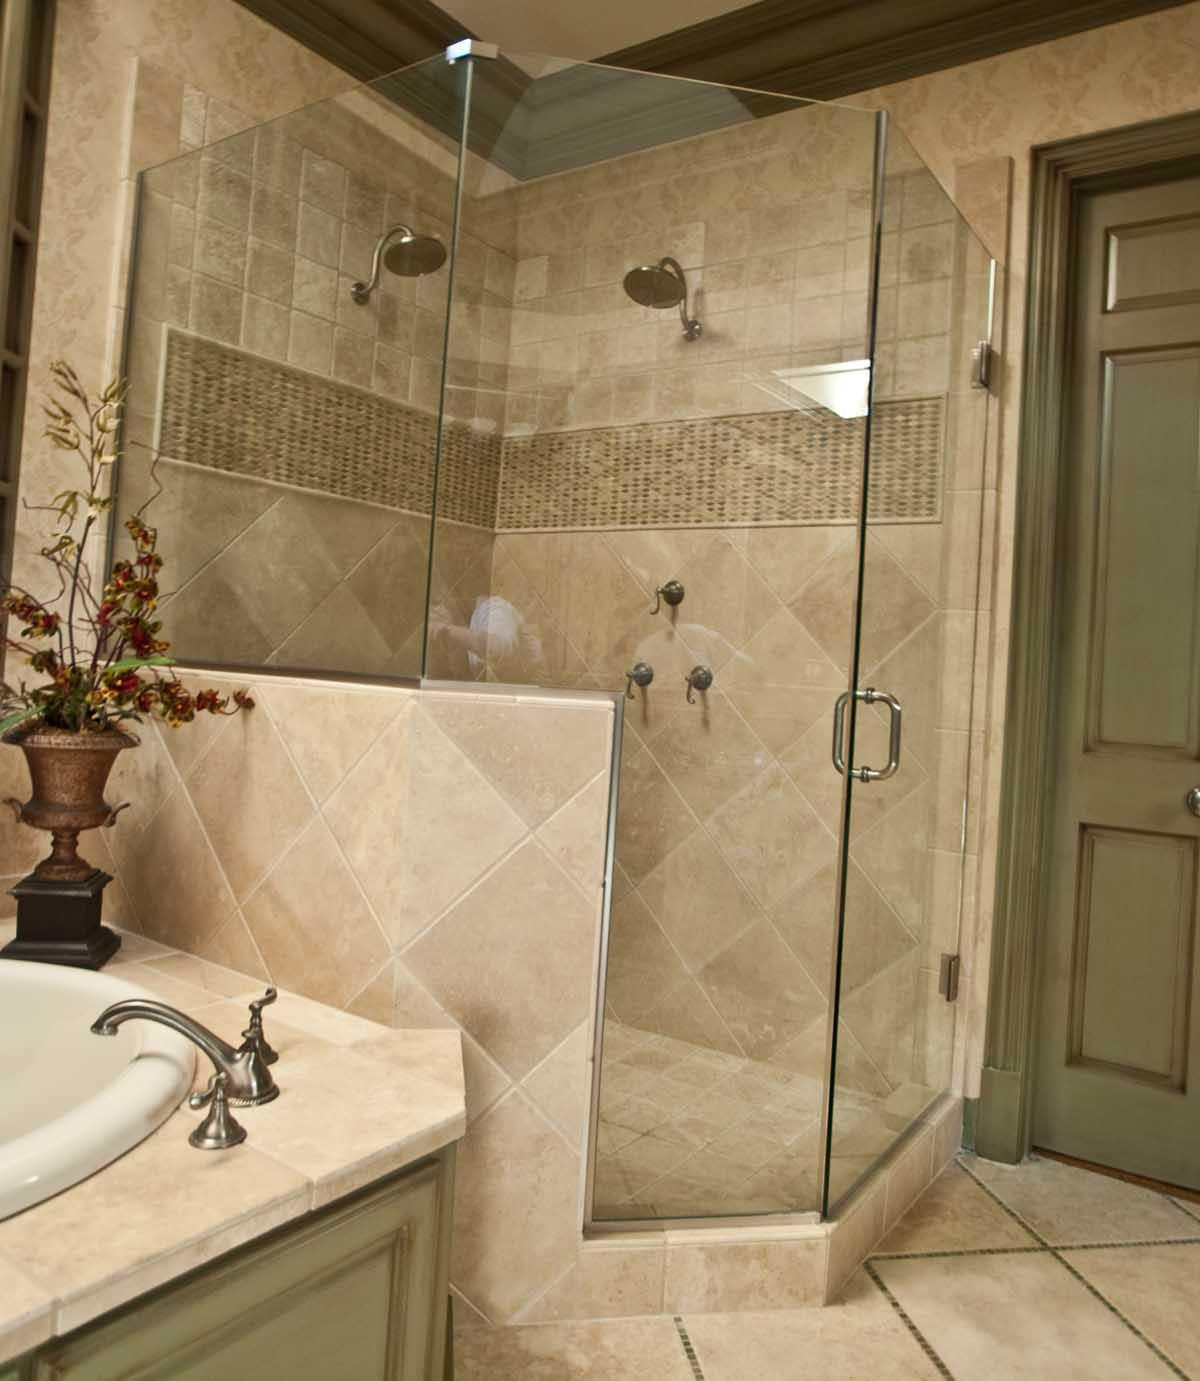 porcelain wall tiles bathroom - Porcelain tiles for bathroom ...